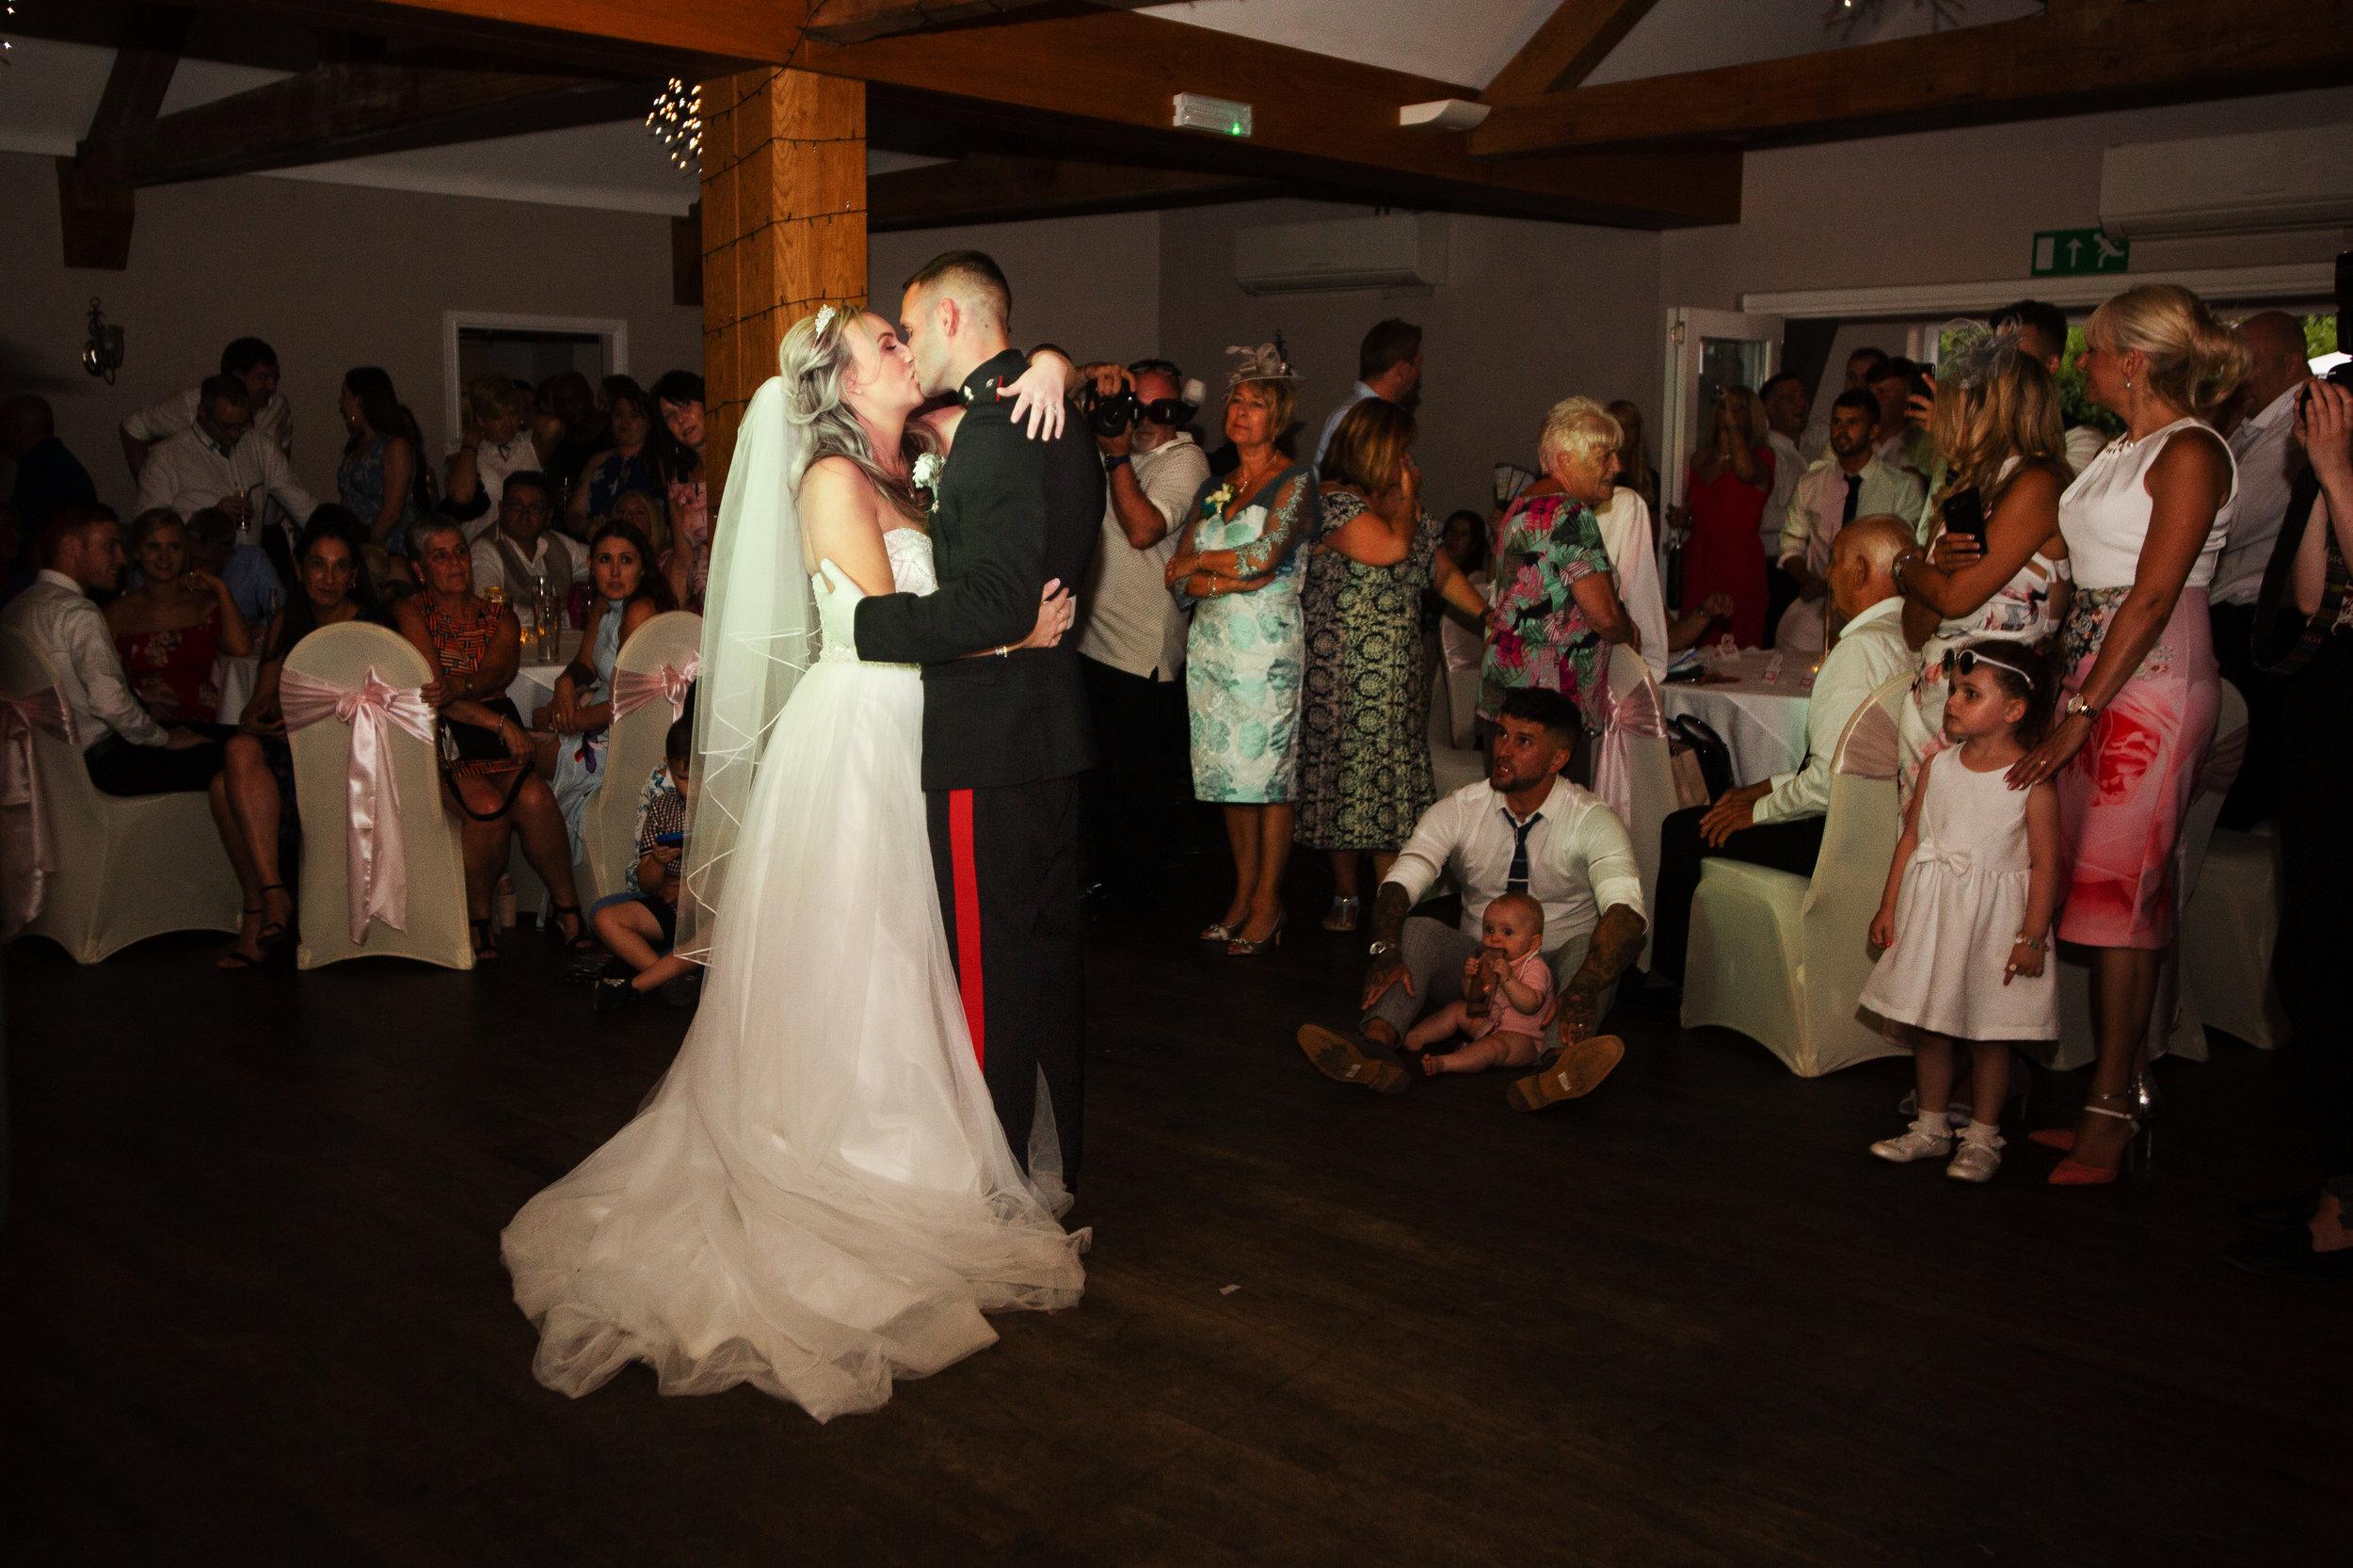 wedding-lea-cooper-photography-willenhall-west-midlands-wolverhampton-dudley-birmingham-uk-marriage-hadley-park-east-telford-first-dance.jpg